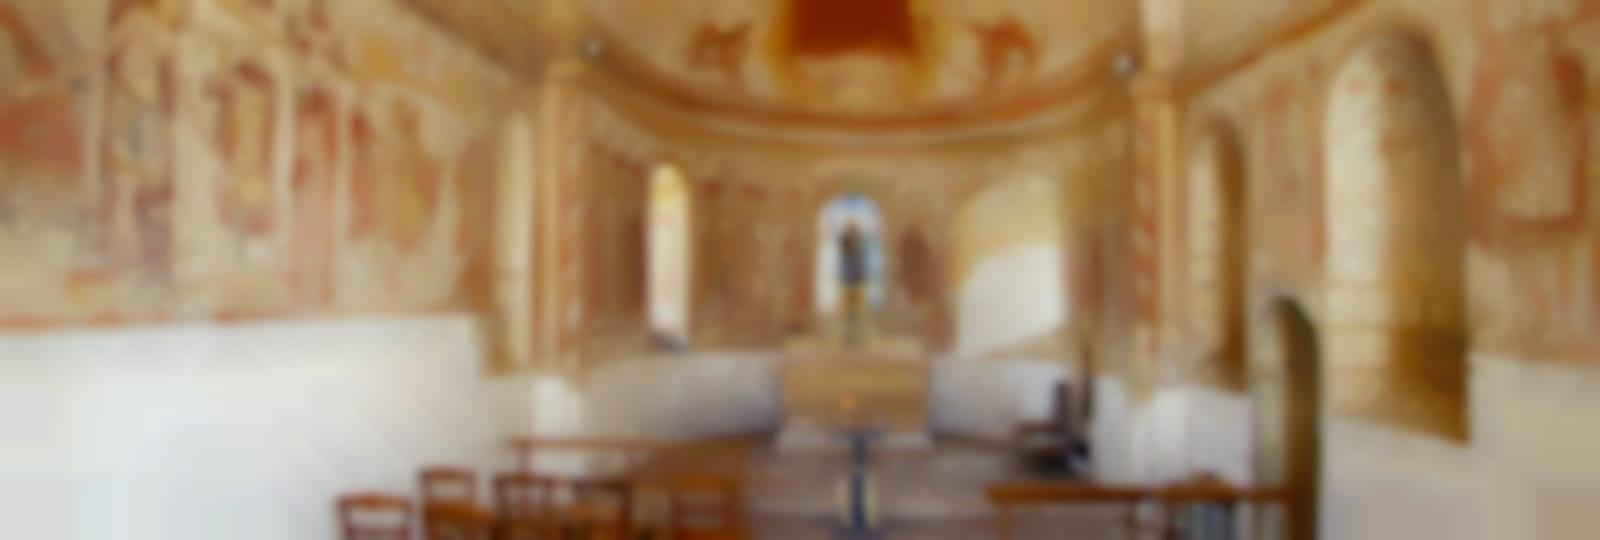 Chapelle romane Notre-Dame d'Yron